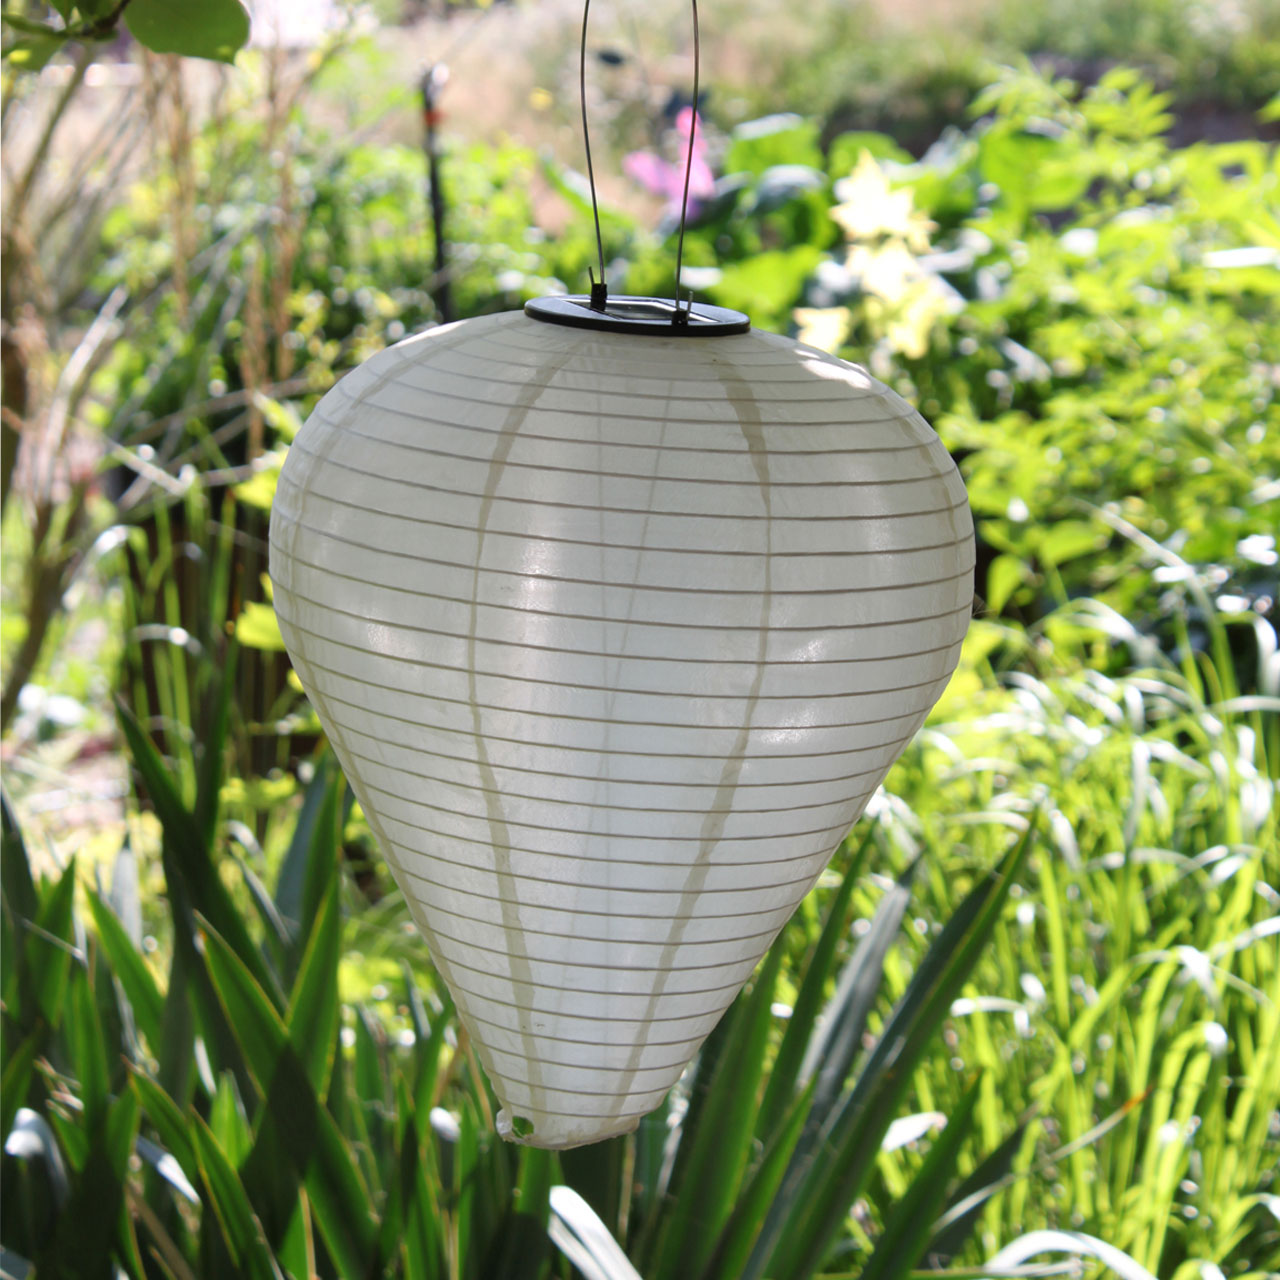 solar led laterne wetterfest ballon sandhell. Black Bedroom Furniture Sets. Home Design Ideas